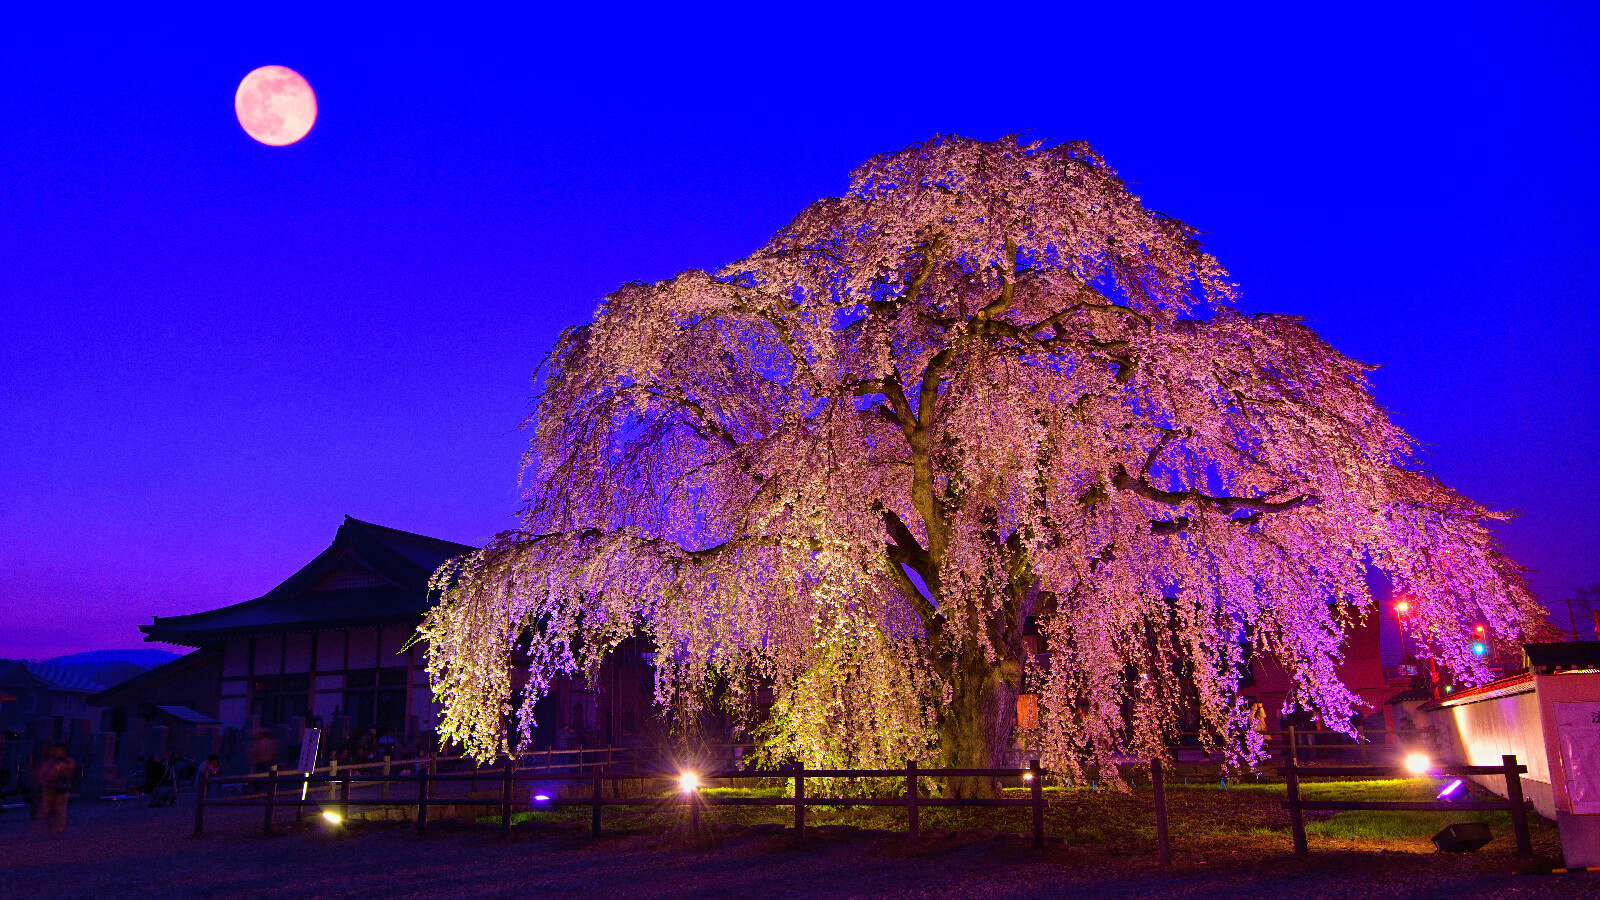 Hokuto Sakura Festival: Illuminated Cherry Blossoms Light Up the Night